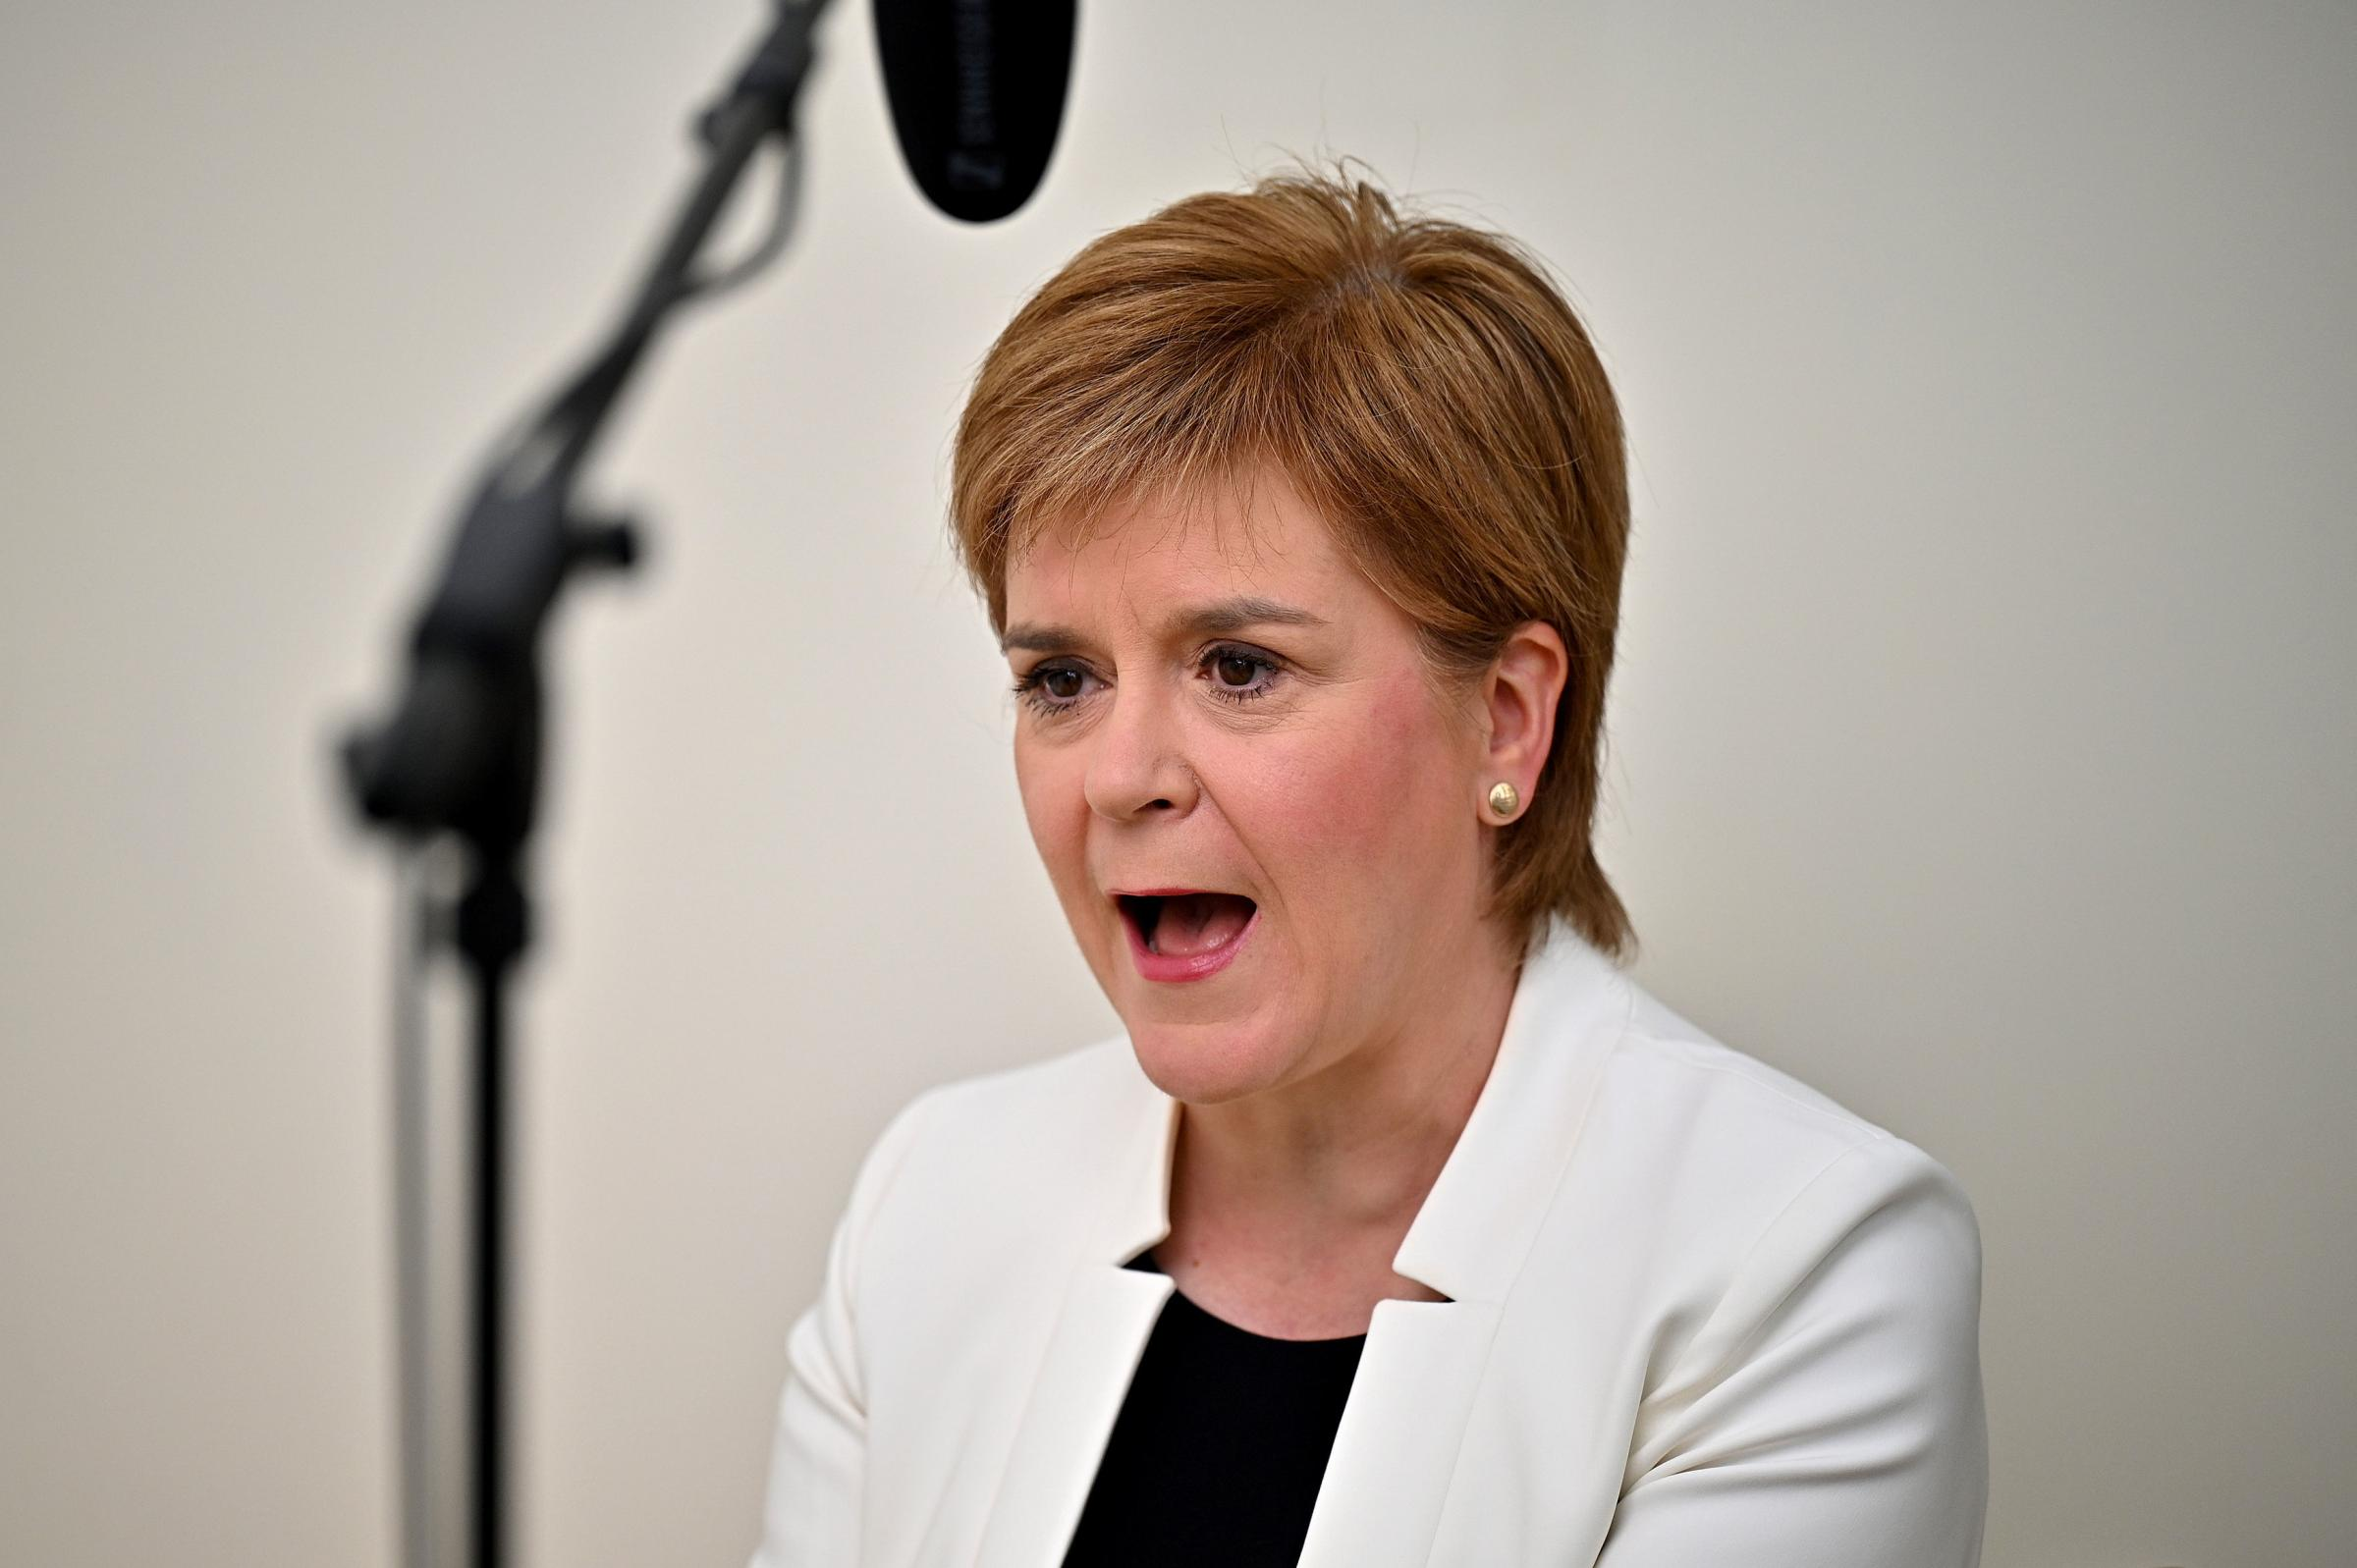 Nicola Sturgeon dismantles claim indy Scotland couldn't have procured vaccines